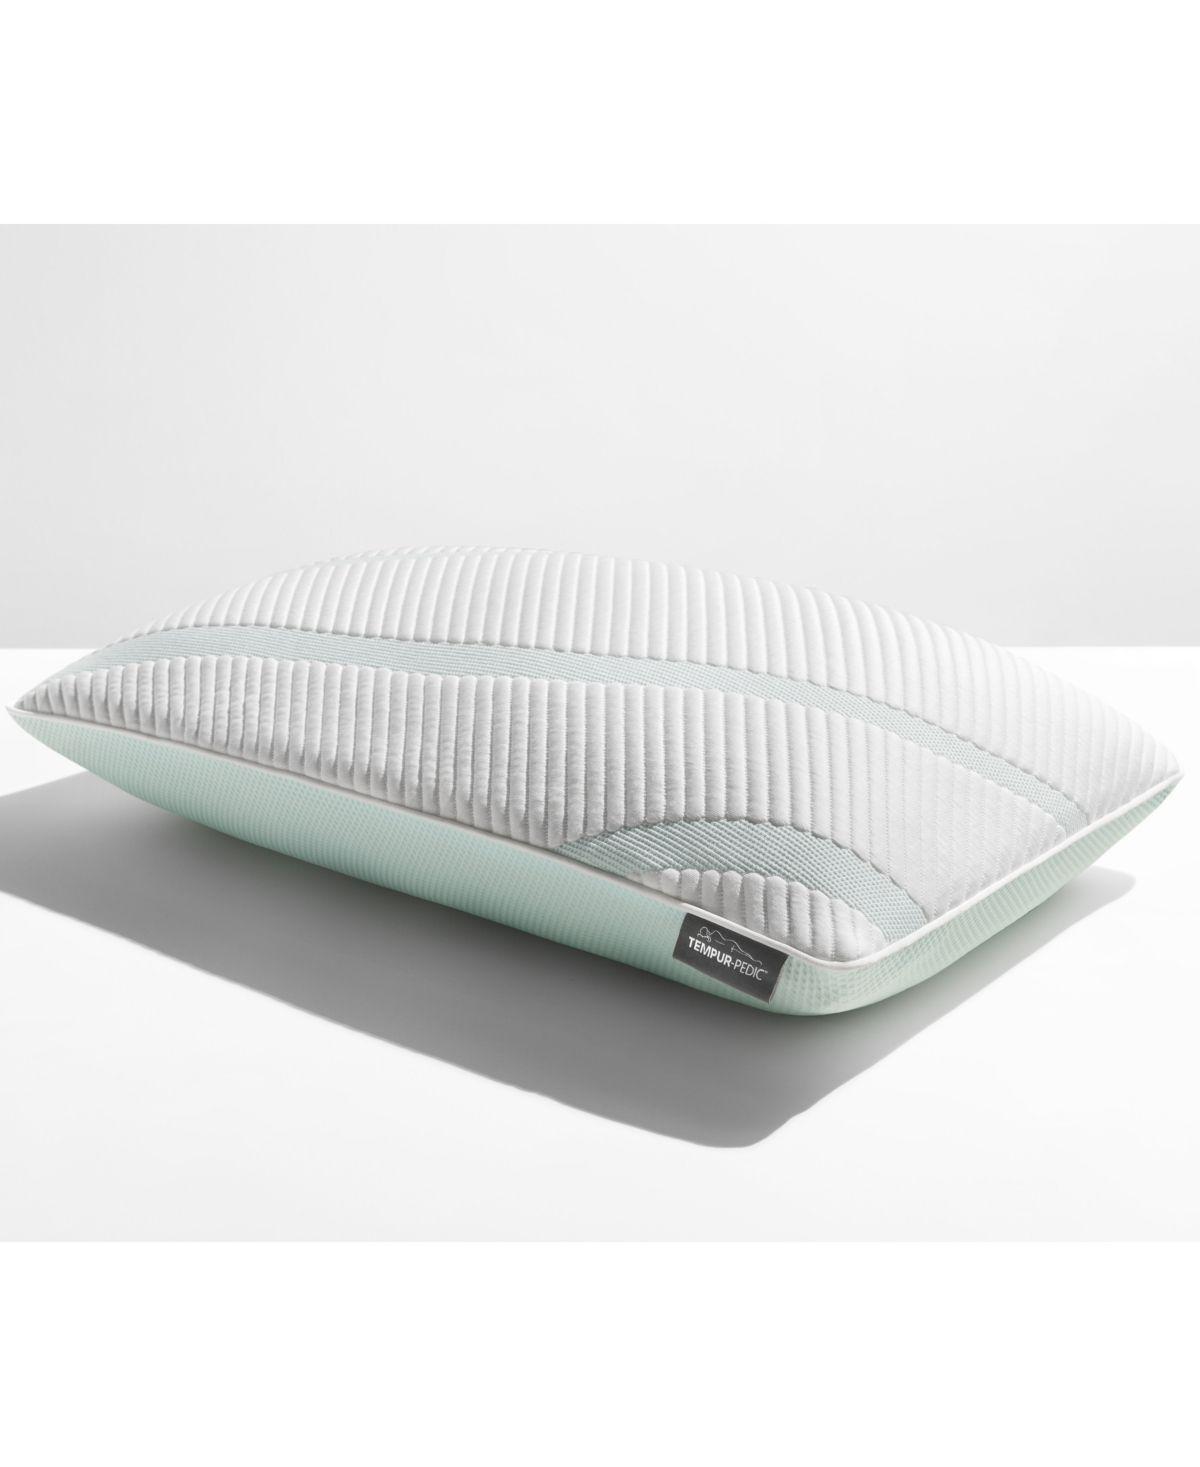 Tempur Pedic Tempur Pedic Tempur Adapt Promid Cooling Pillow